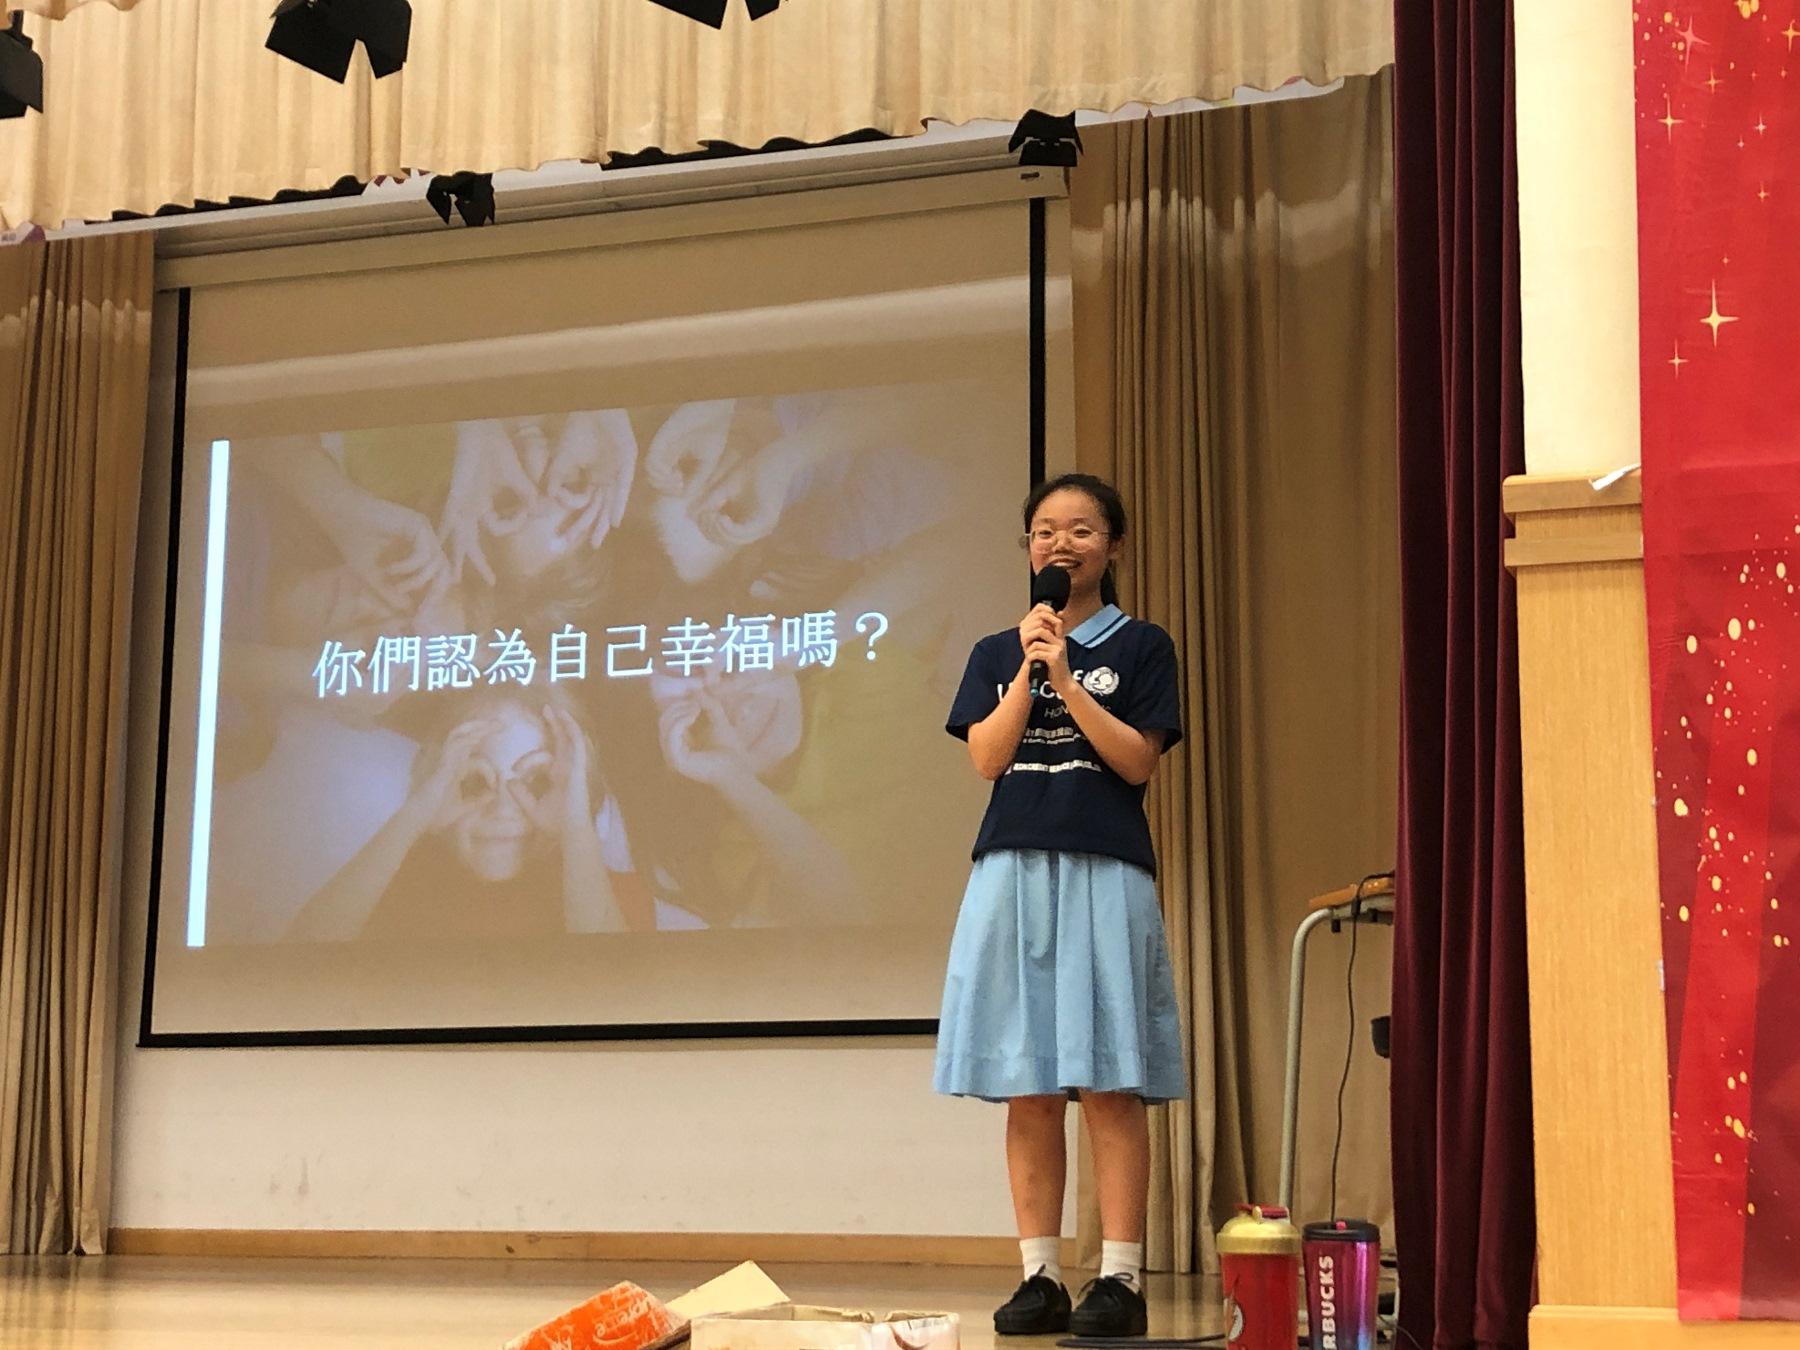 http://npc.edu.hk/sites/default/files/img_5445.jpg